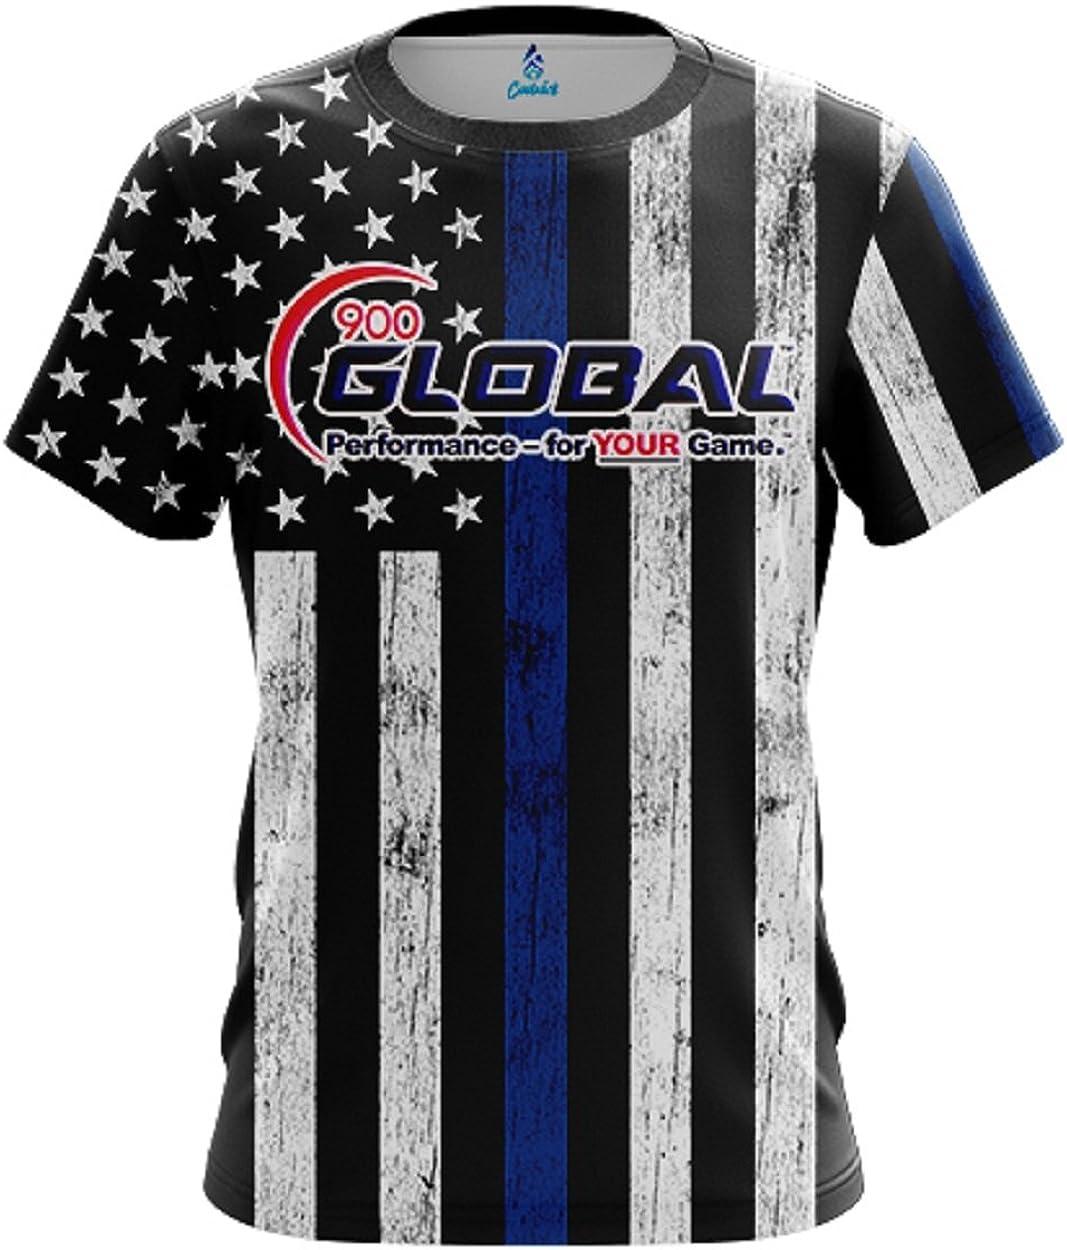 CoolWick 900 Global Mens Movie Reel Purple Bowling Jersey